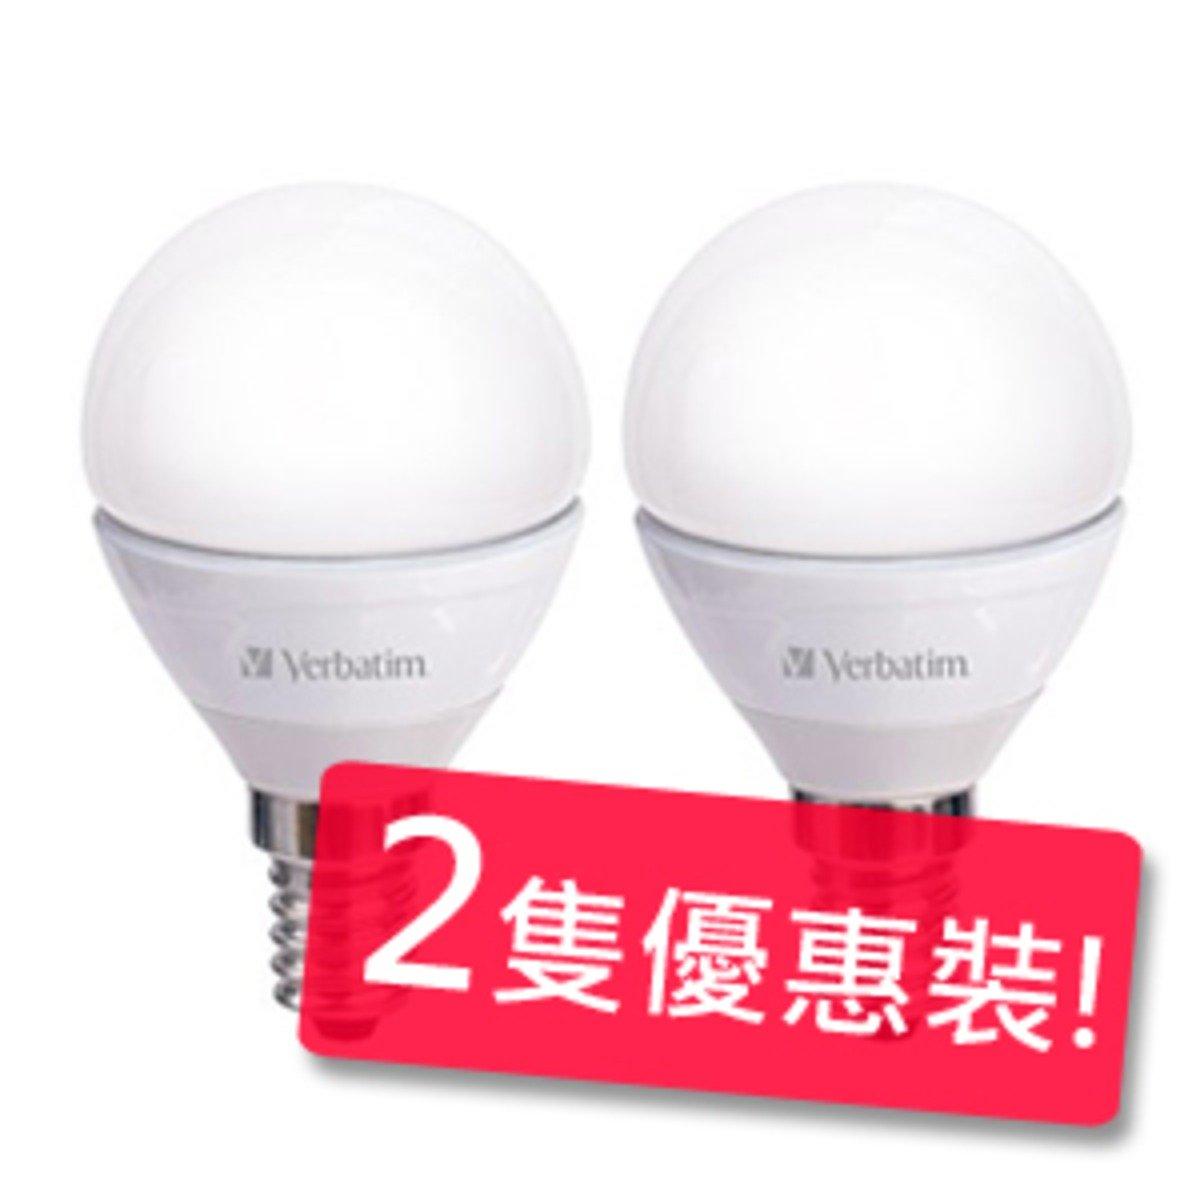 Verbatim 4.5瓦 E14 350lm 3000k 燈泡 (暖白) 2隻優惠裝